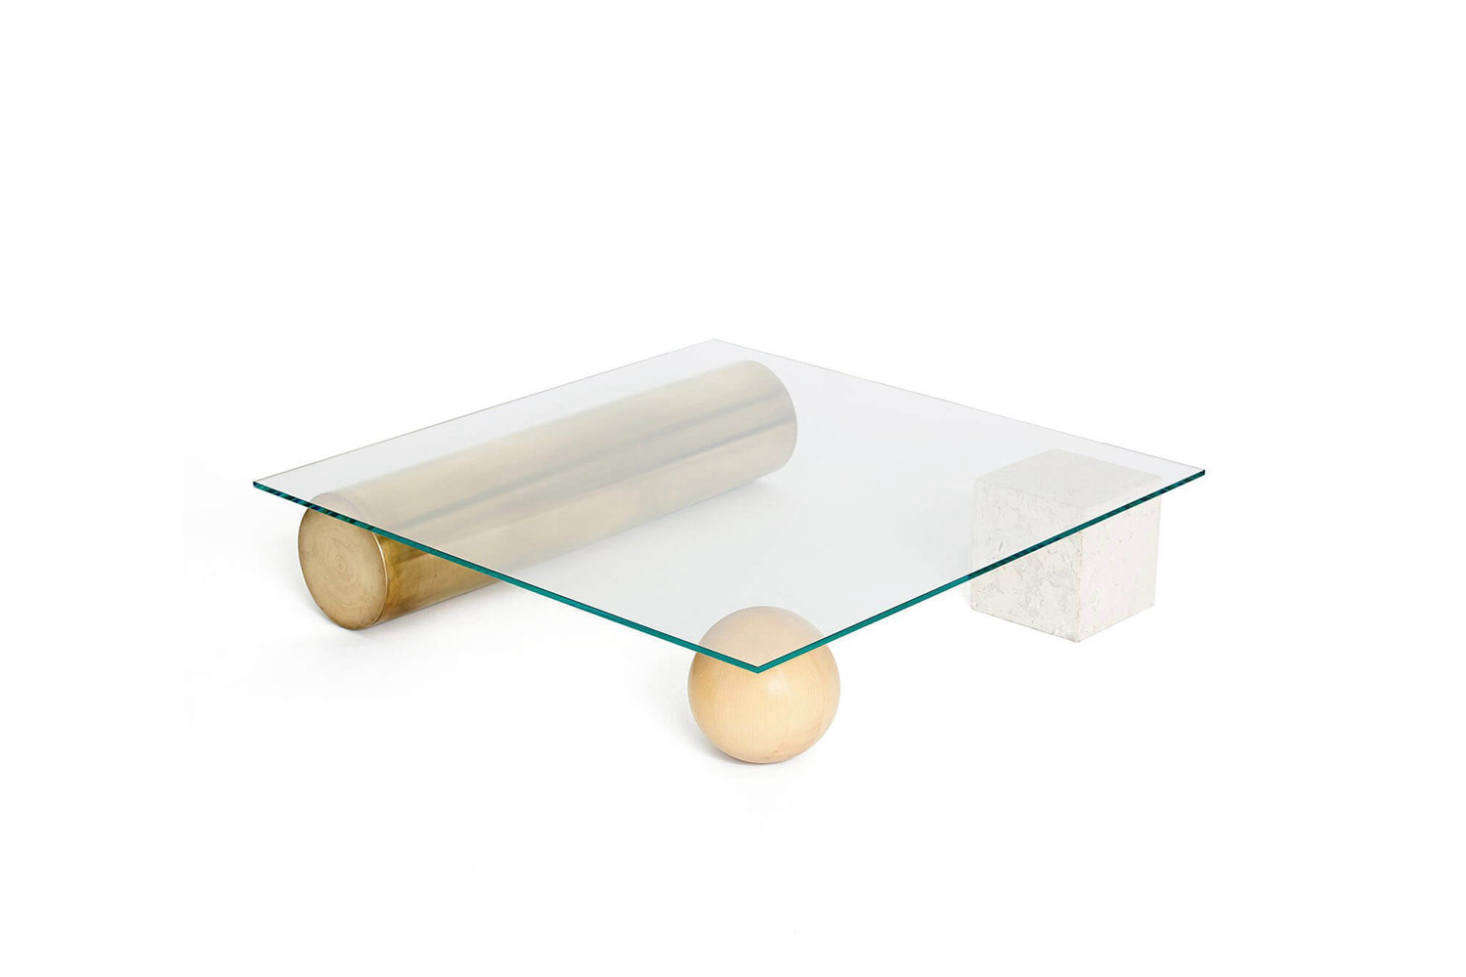 faye toogood element table 1466x977